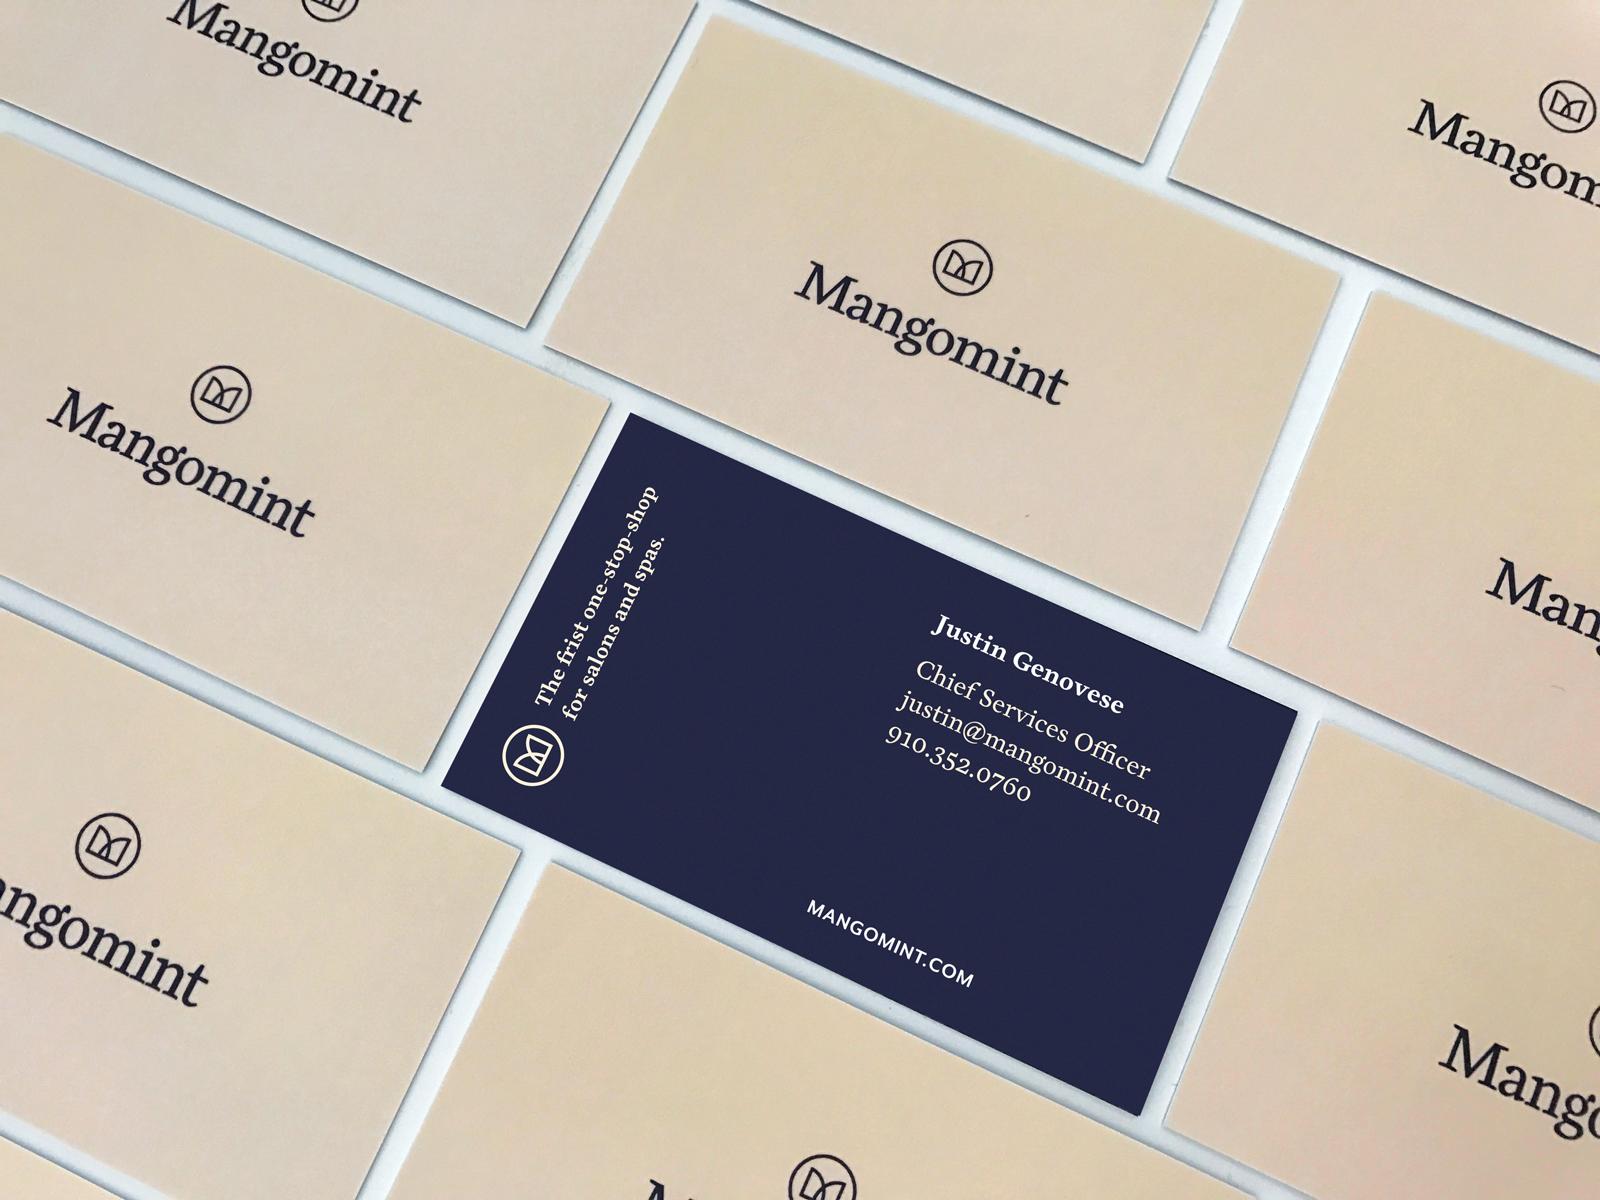 Mangomint_Cards_Site2.jpg